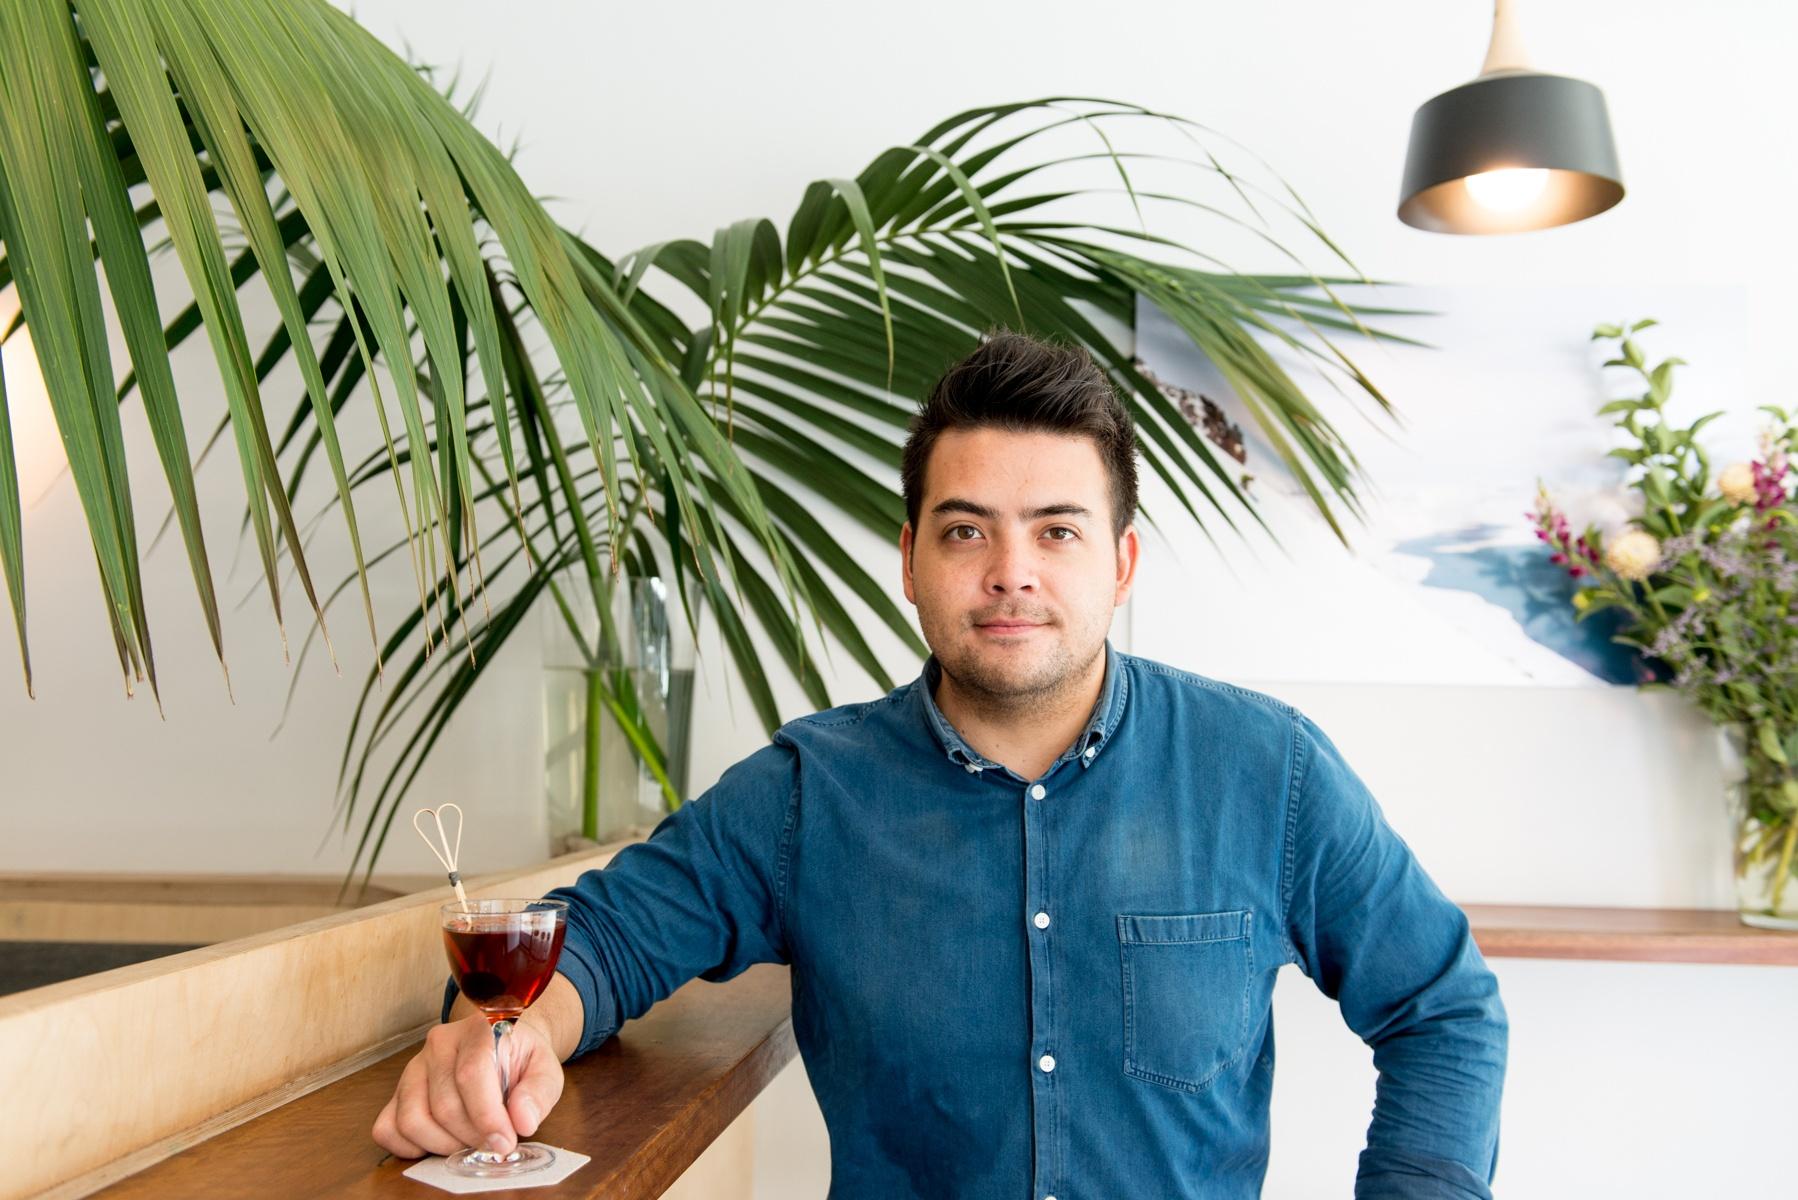 Charles_Ainsbury_Australias_Best_Bartender.jpg